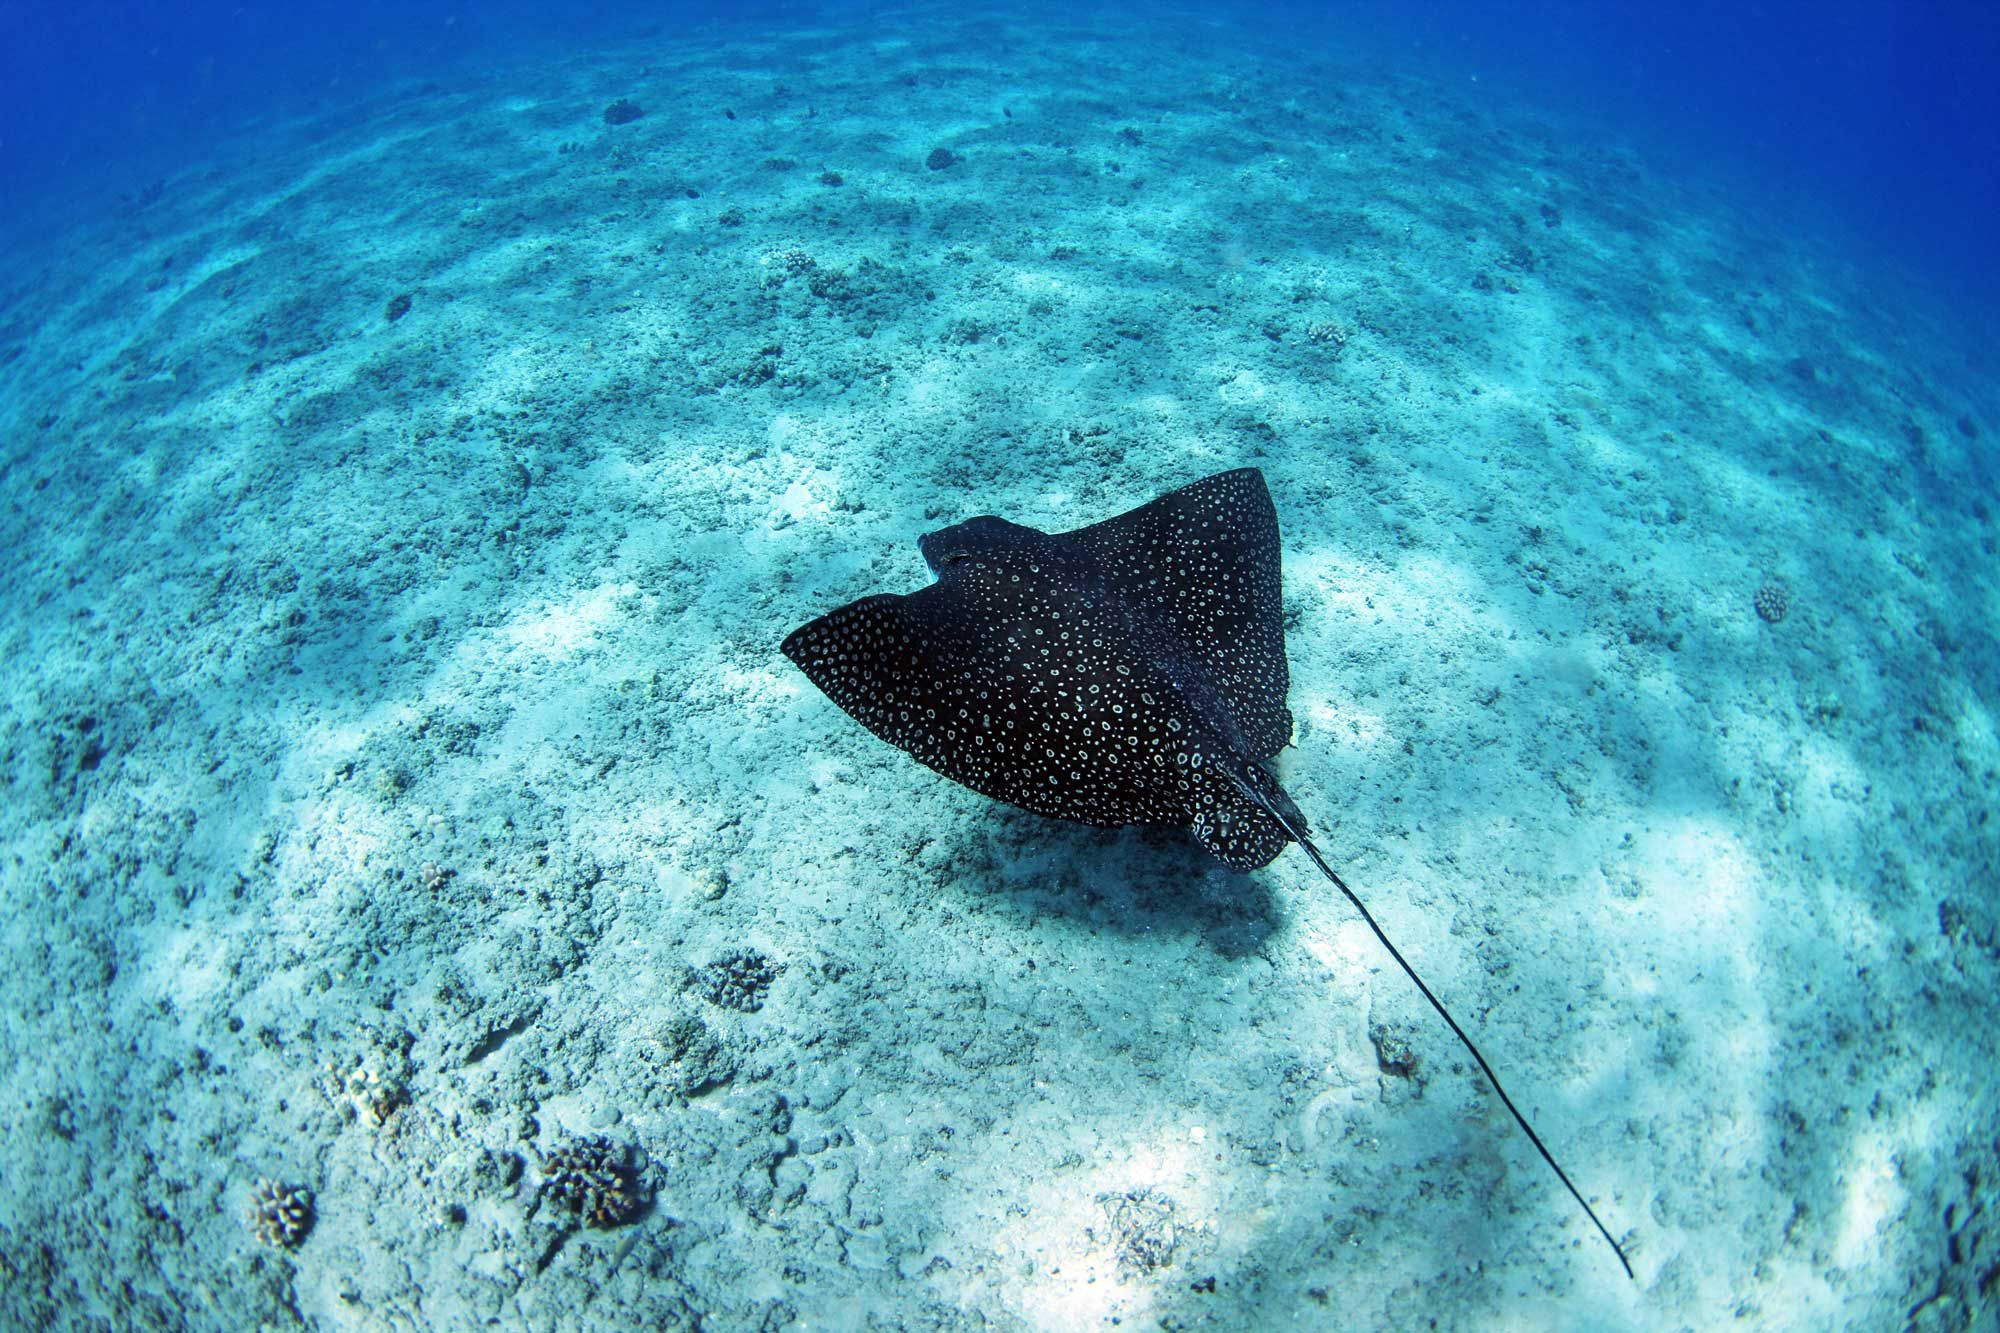 Best Snorkeling in Hawaii, Snorkeling the Hawaiian Islands